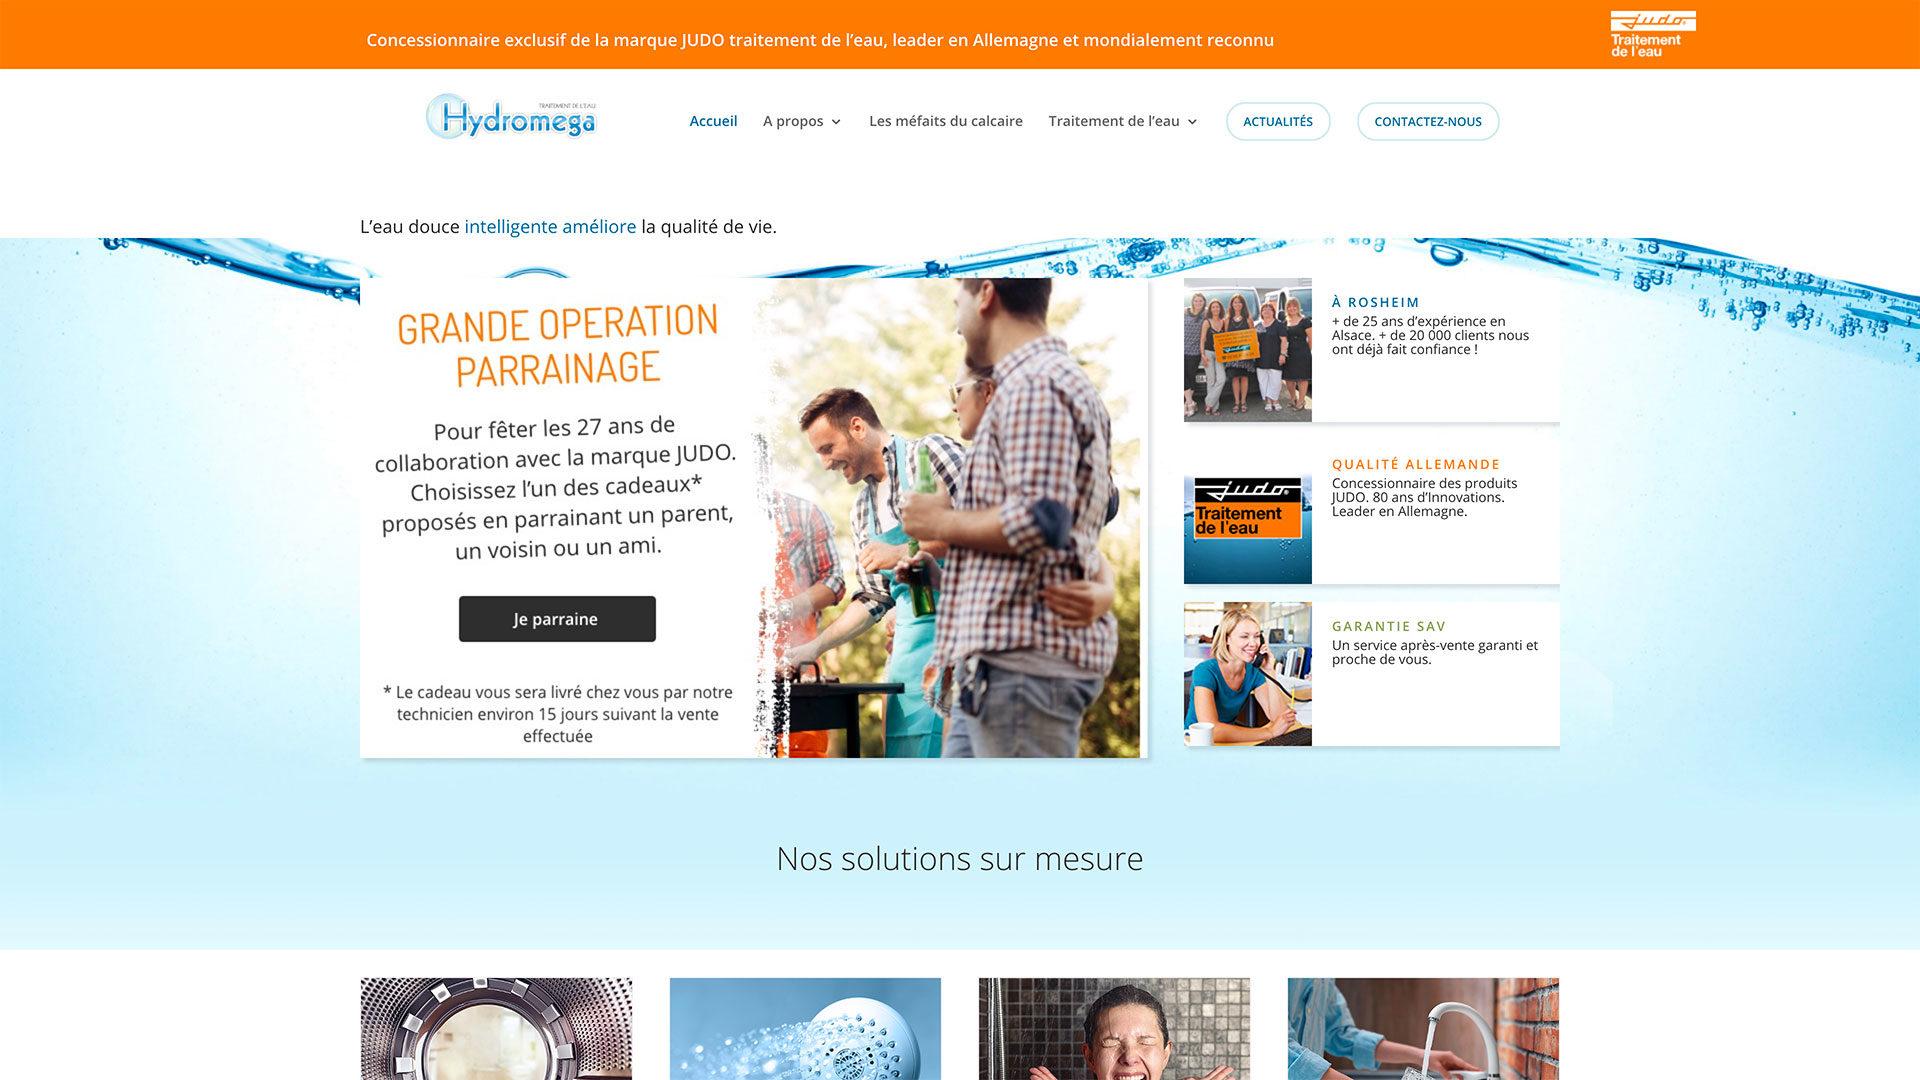 hydromega.fr